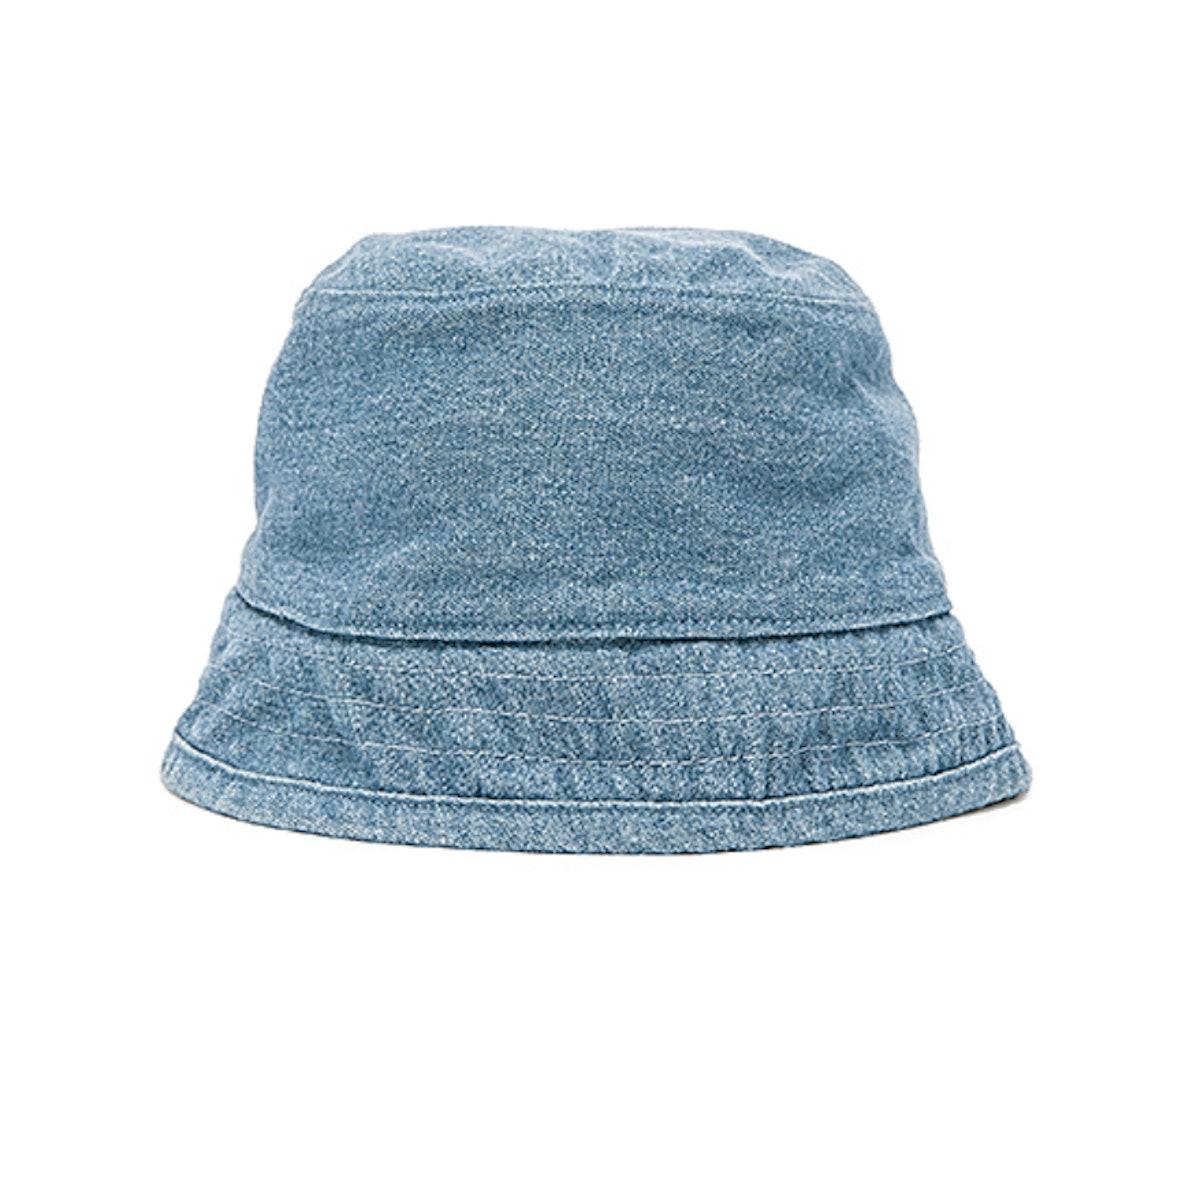 Hat Attack Washed Cotton Bucket Hat